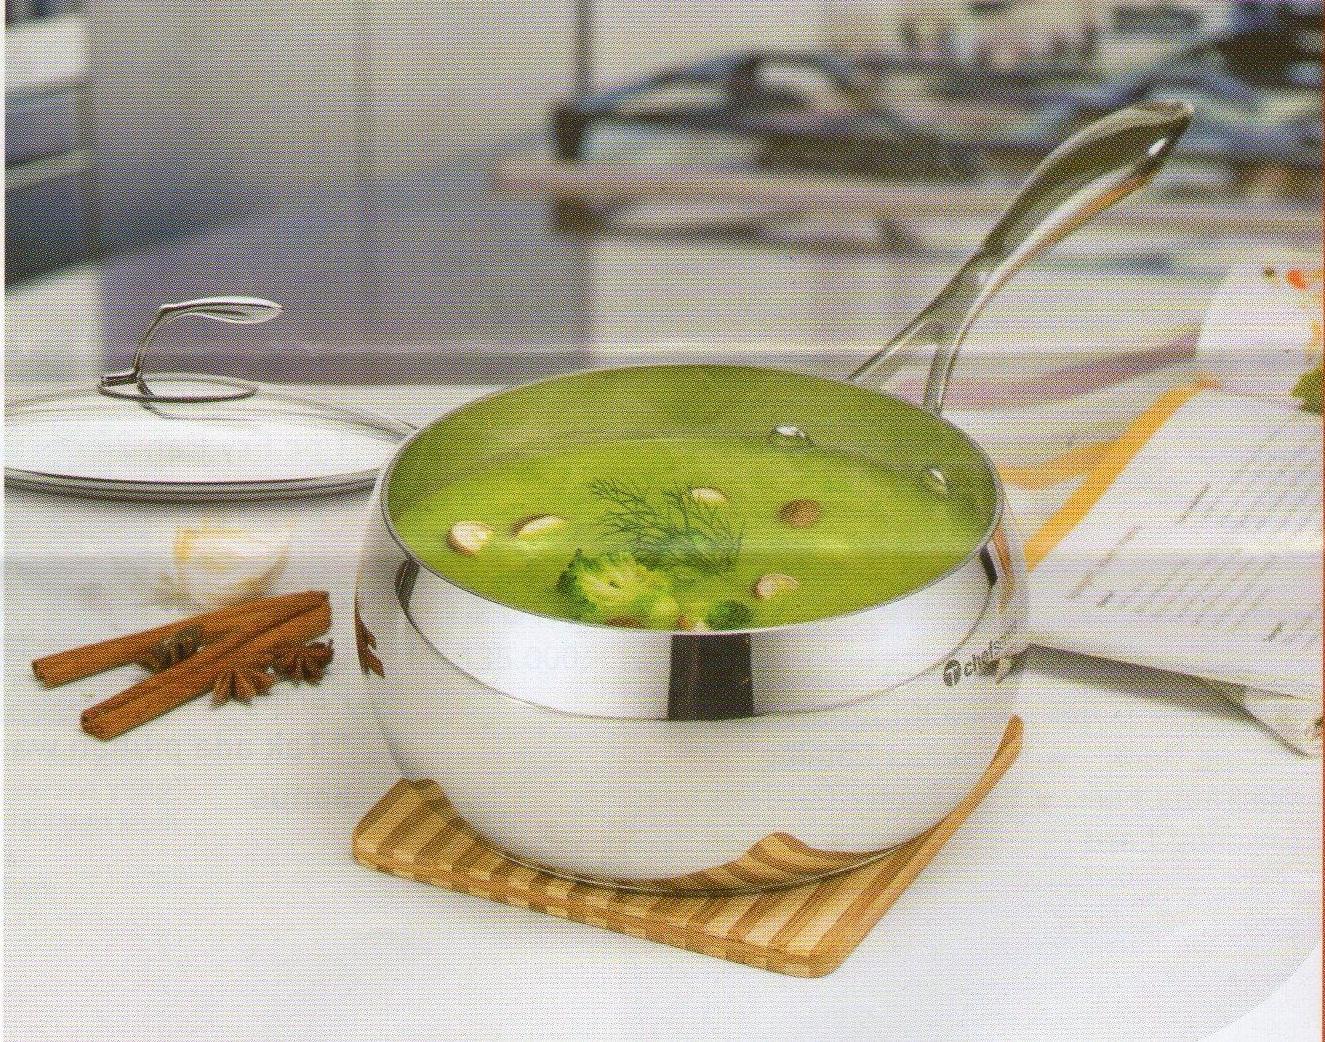 Tupperware Lovely Cookware Tchef Series Fry Pan Tc01 Sauce